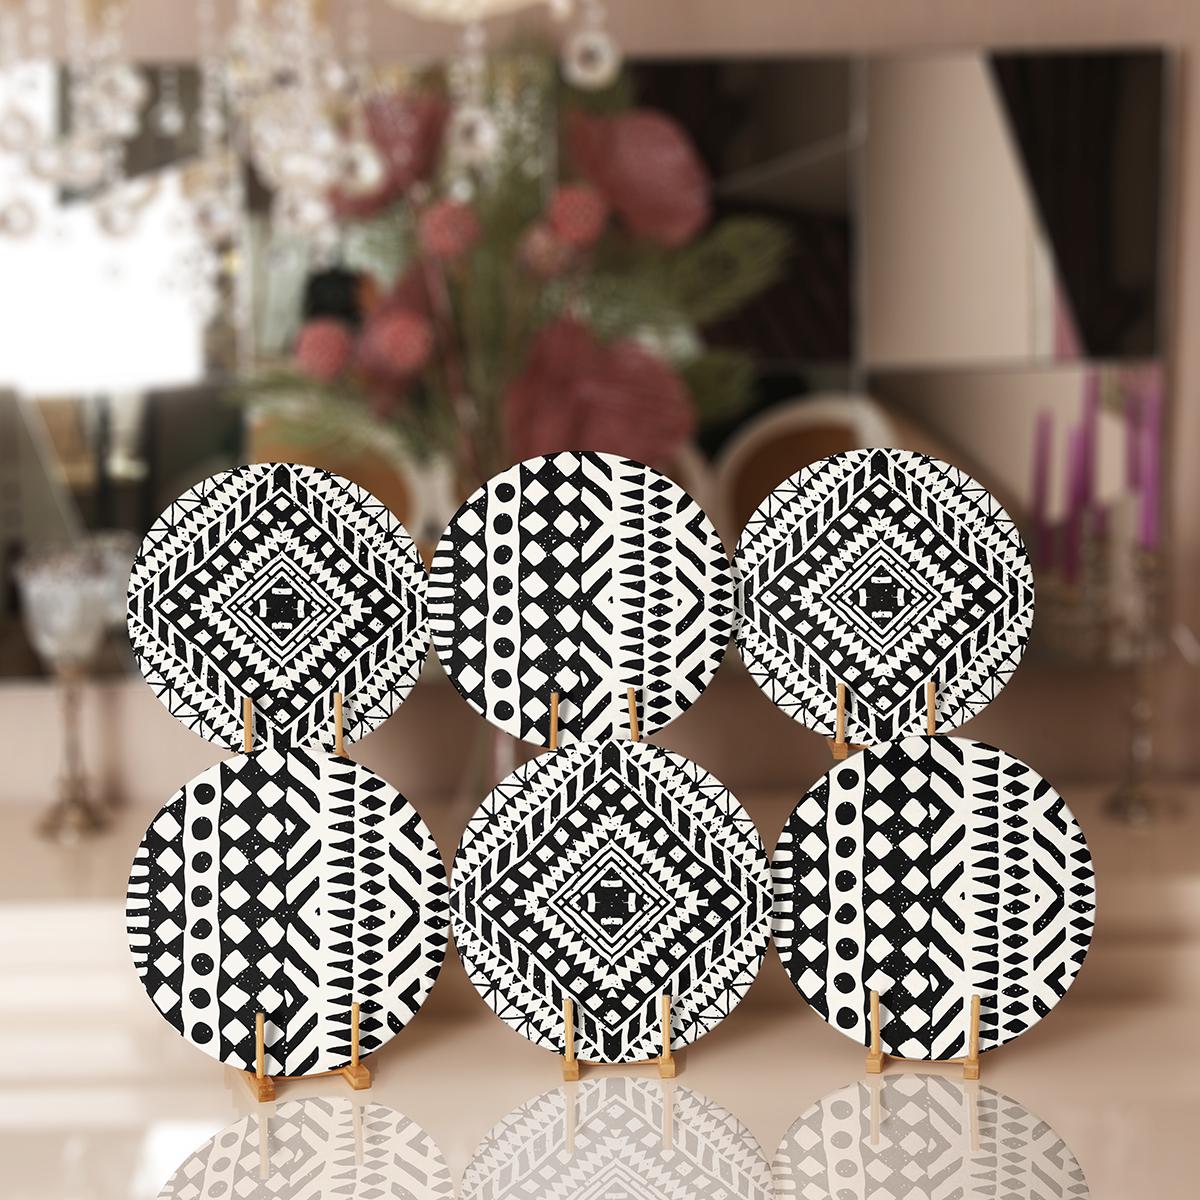 6'lı Siyah Beyaz Etnik Geometrik Çizimli Servis Altlığı & Supla Realhomes